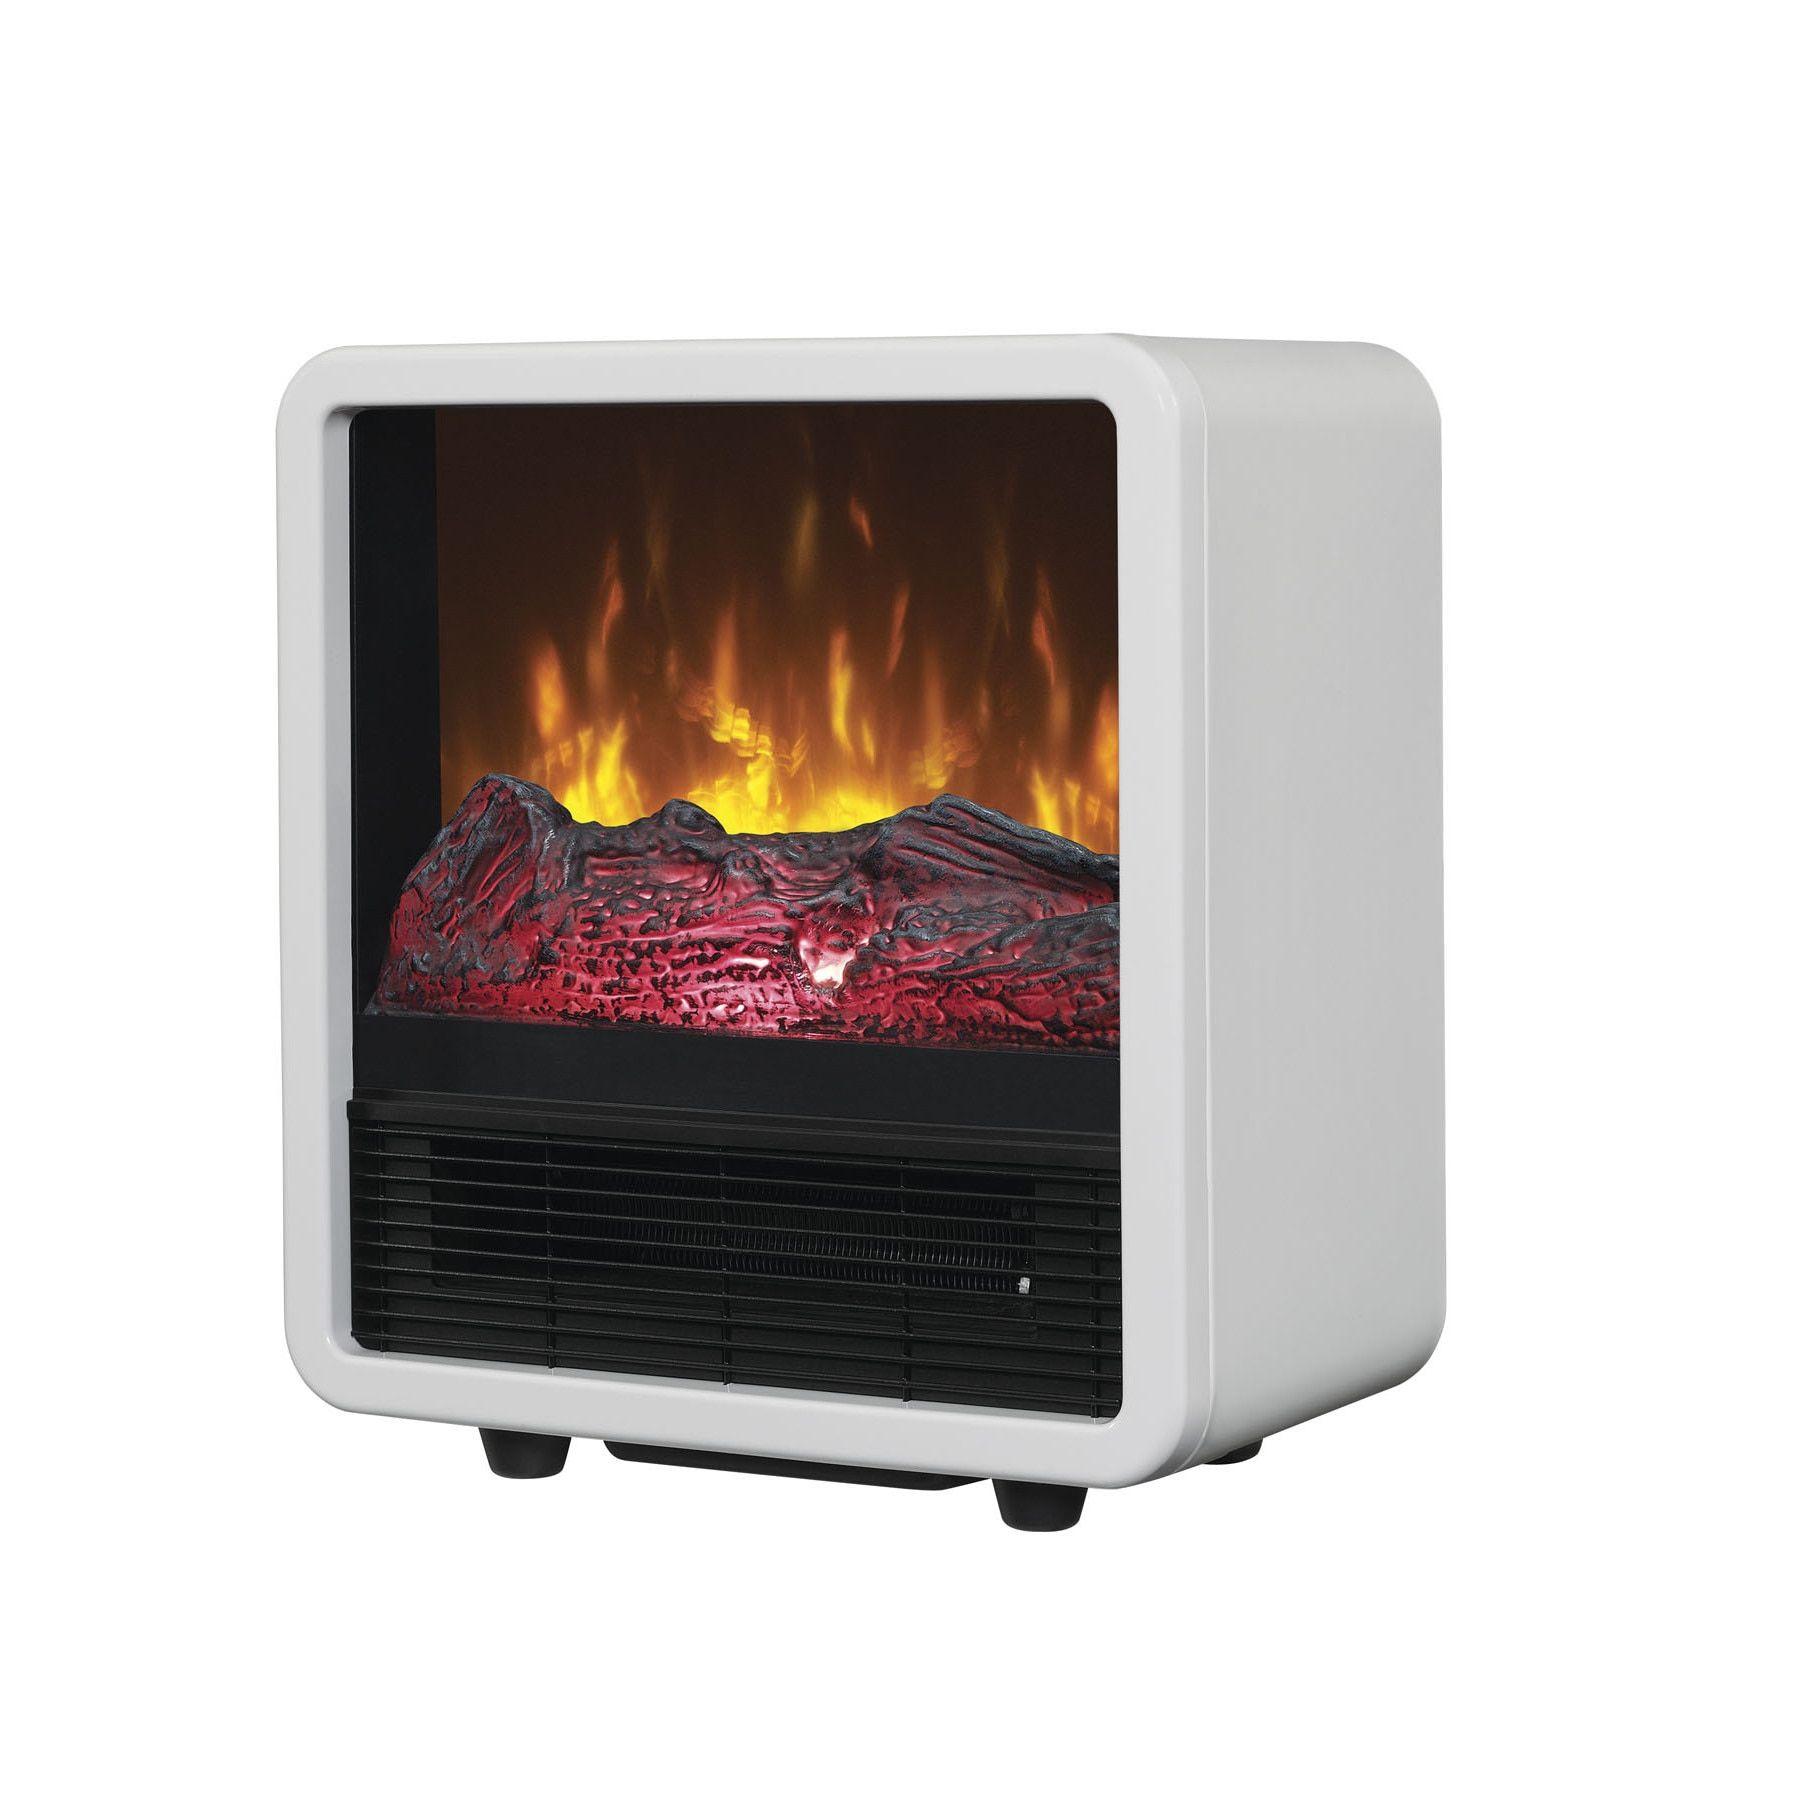 duraflame dfs 300 bpra004 personal space heater bedroom ideas rh pinterest com